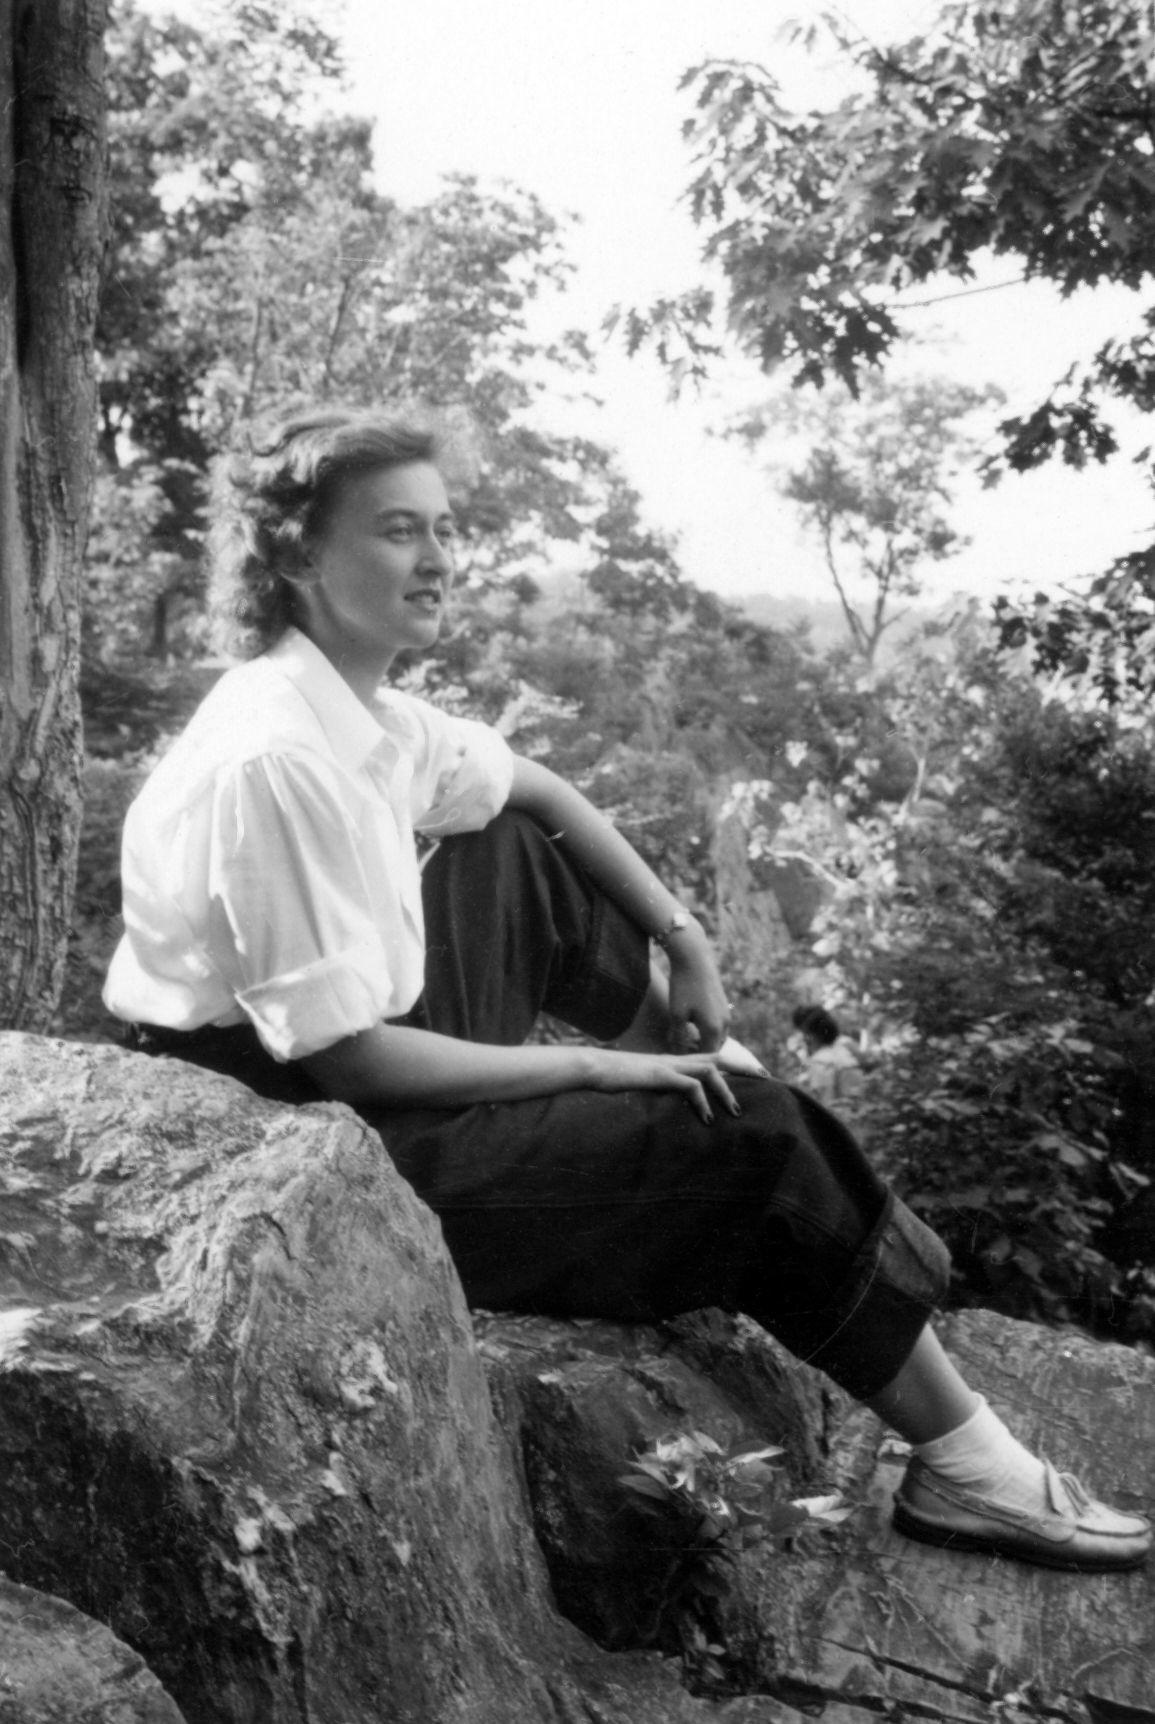 Lorraine on a hike